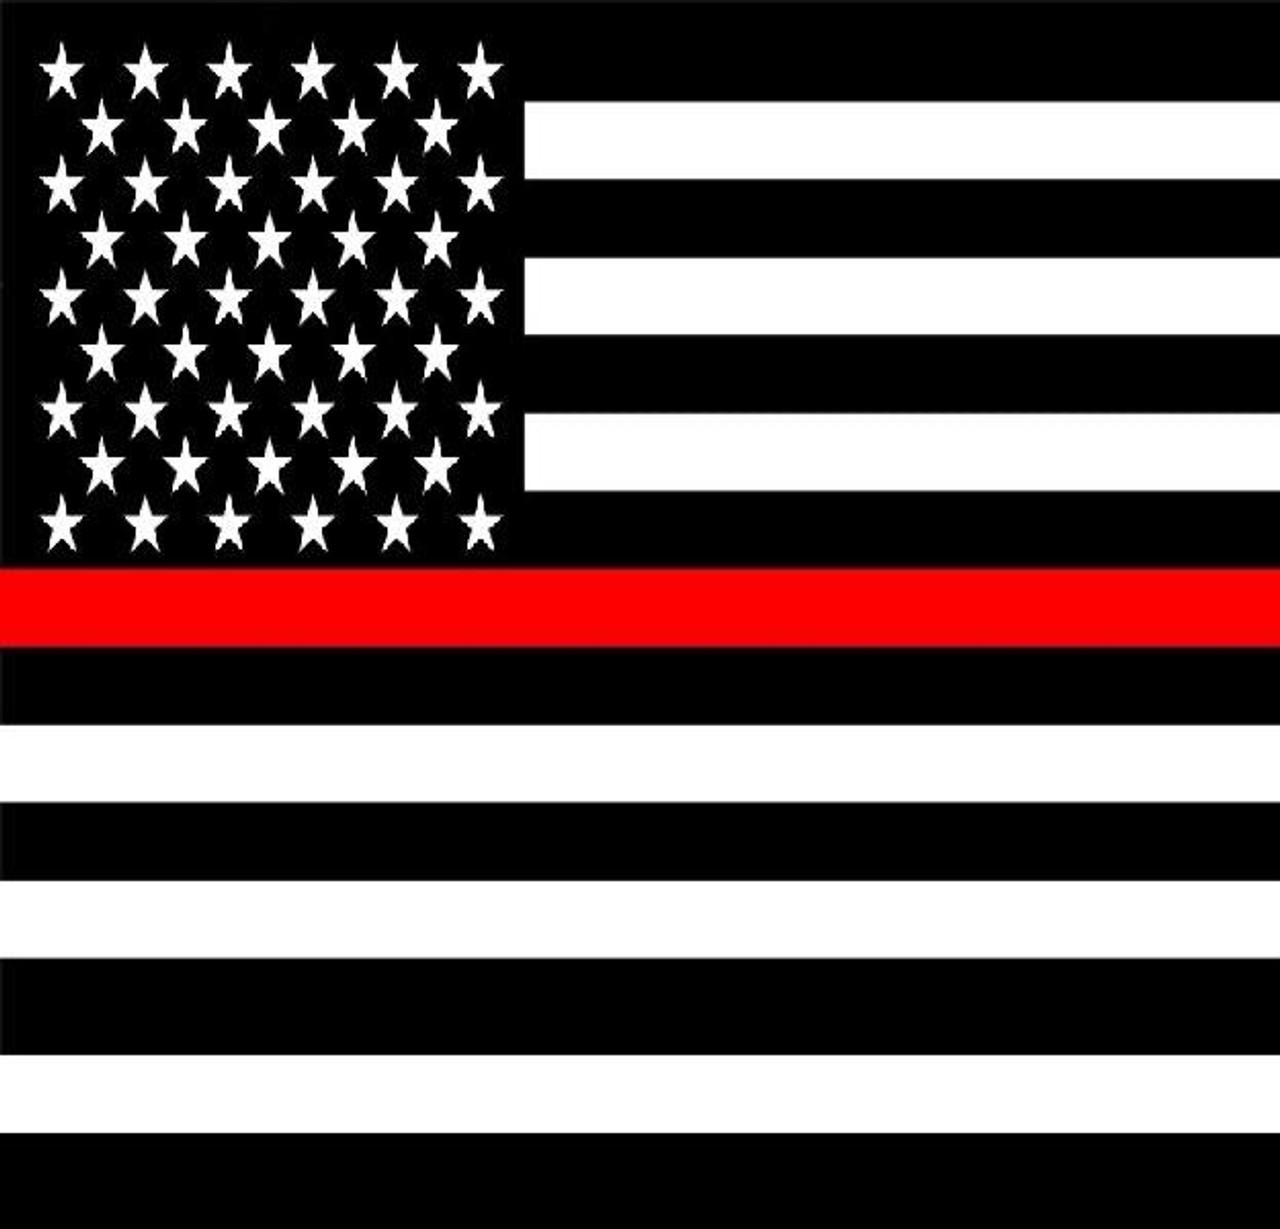 USA RED Line Bandana